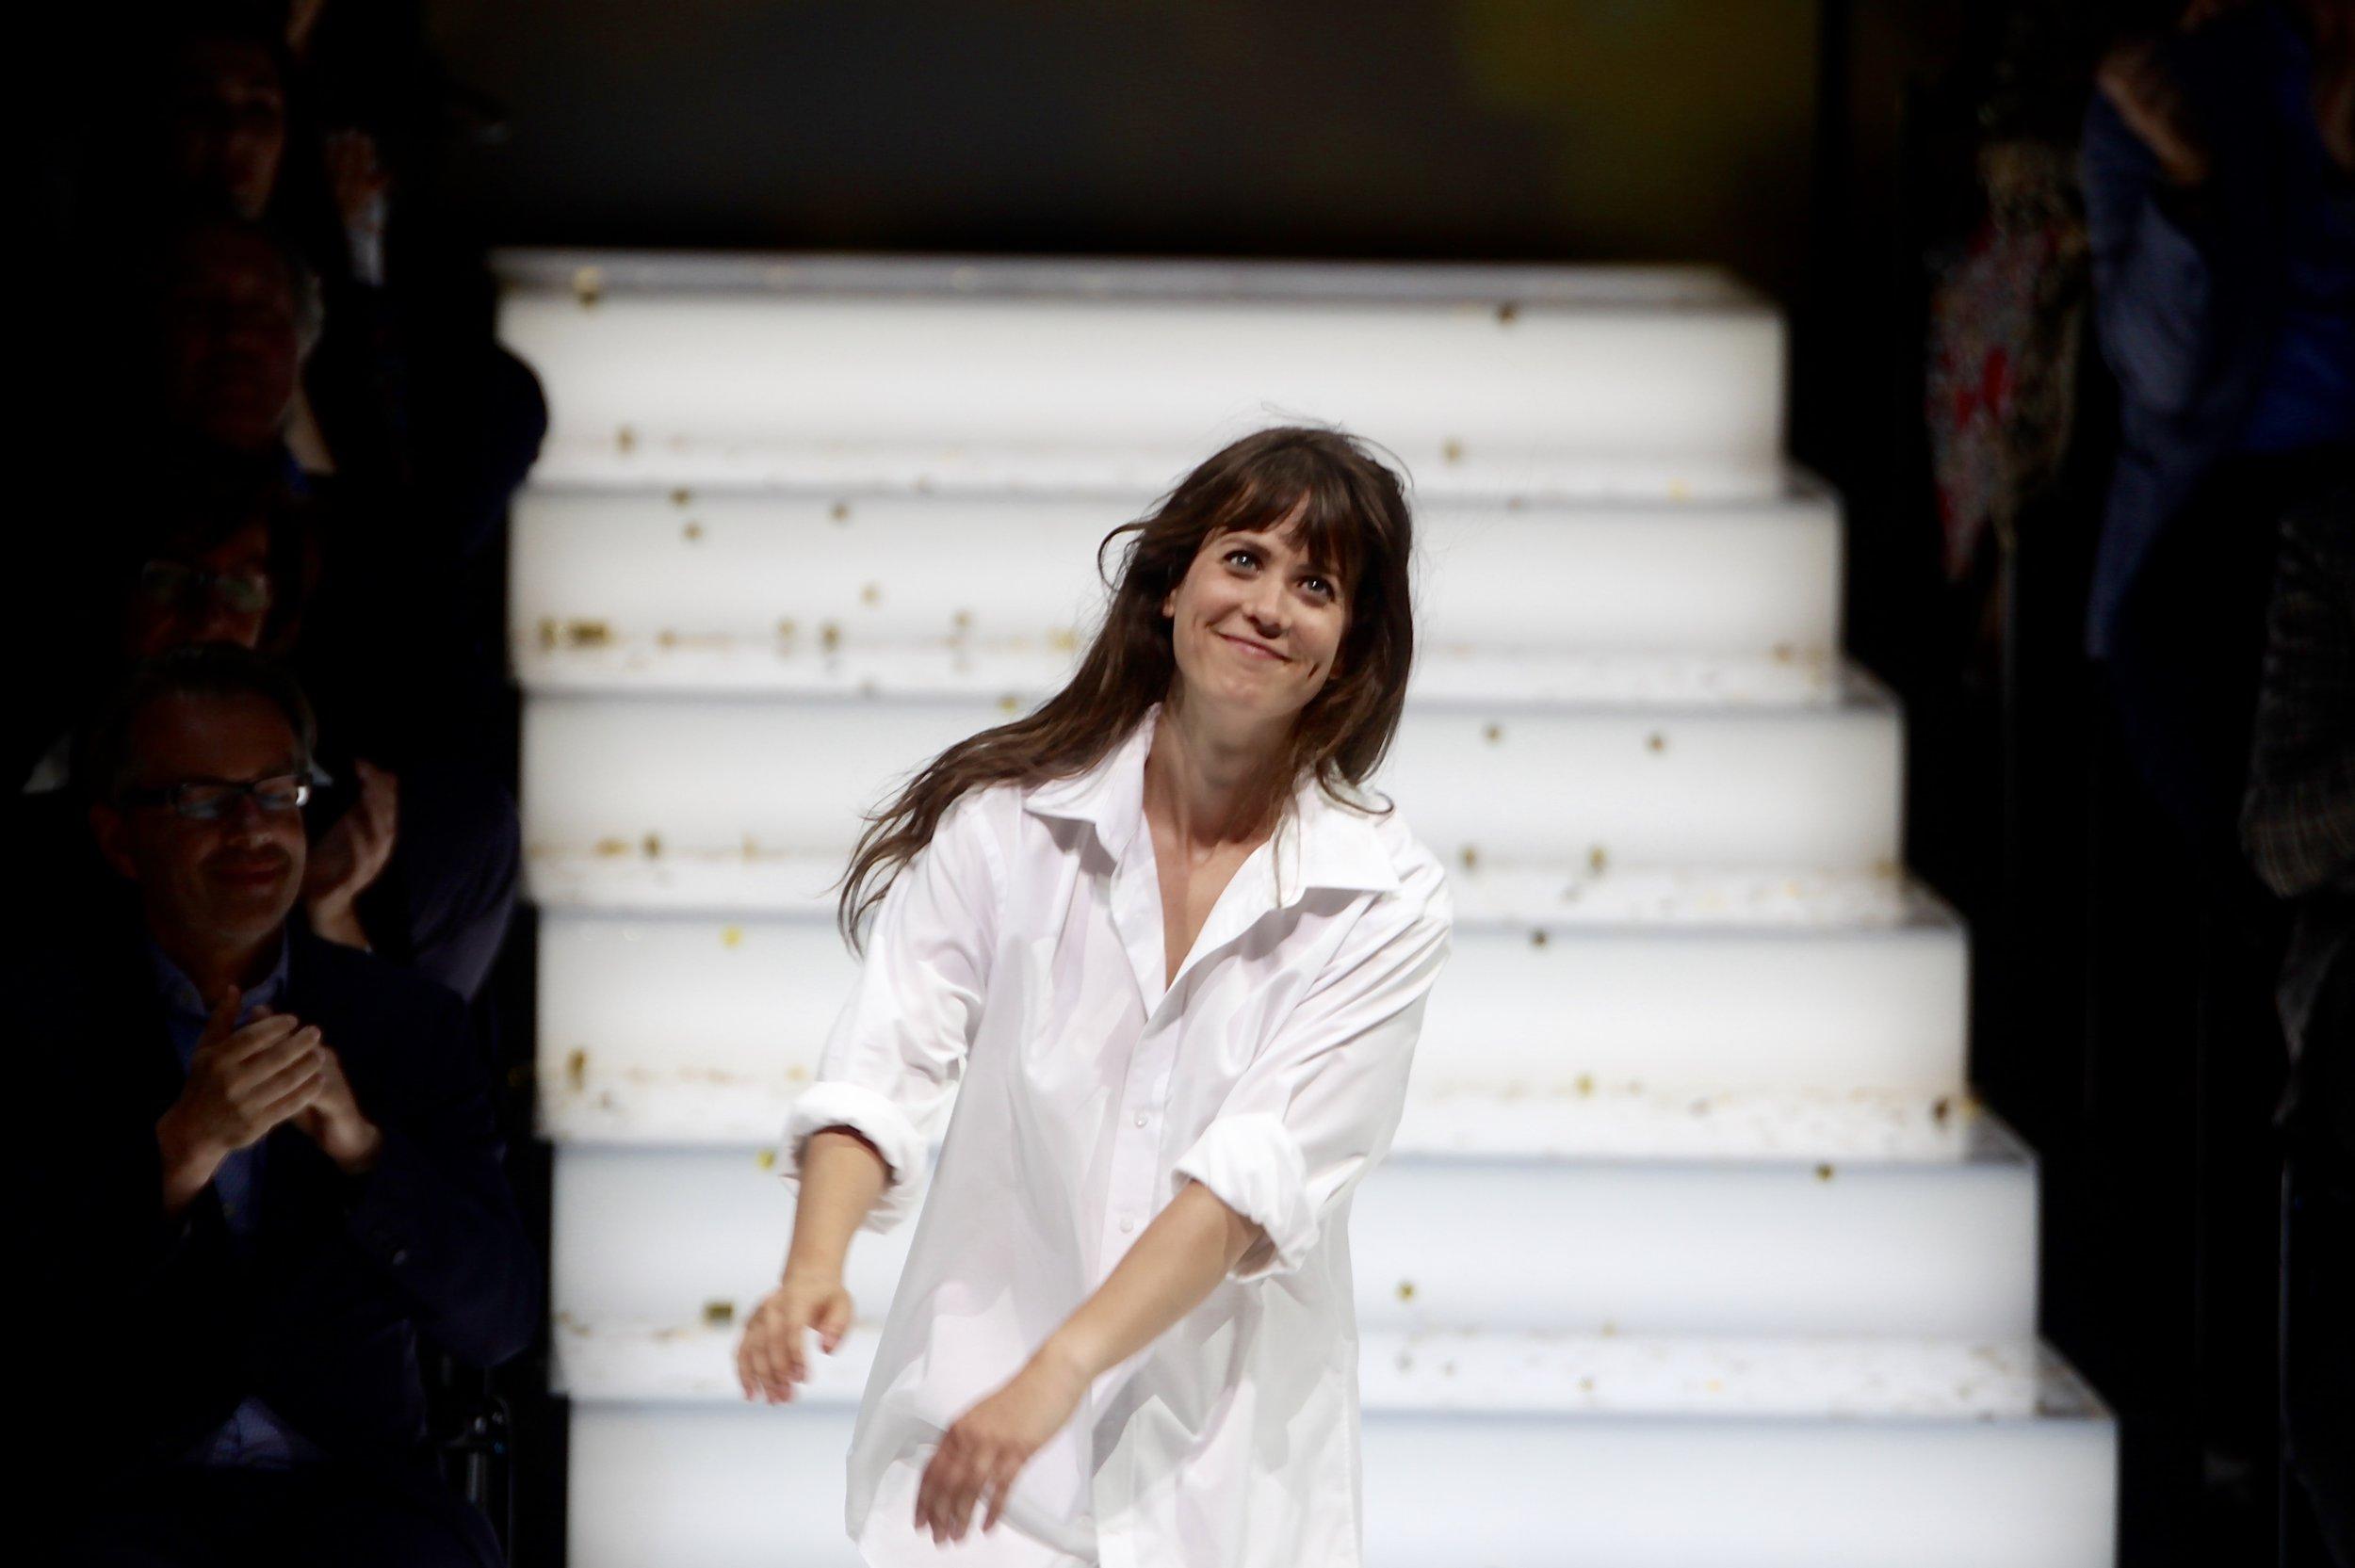 Fortuna & Damigella - L'incoronazione di Poppea - Opernhaus Zürich 2018 - Photo: Conny Butzbach